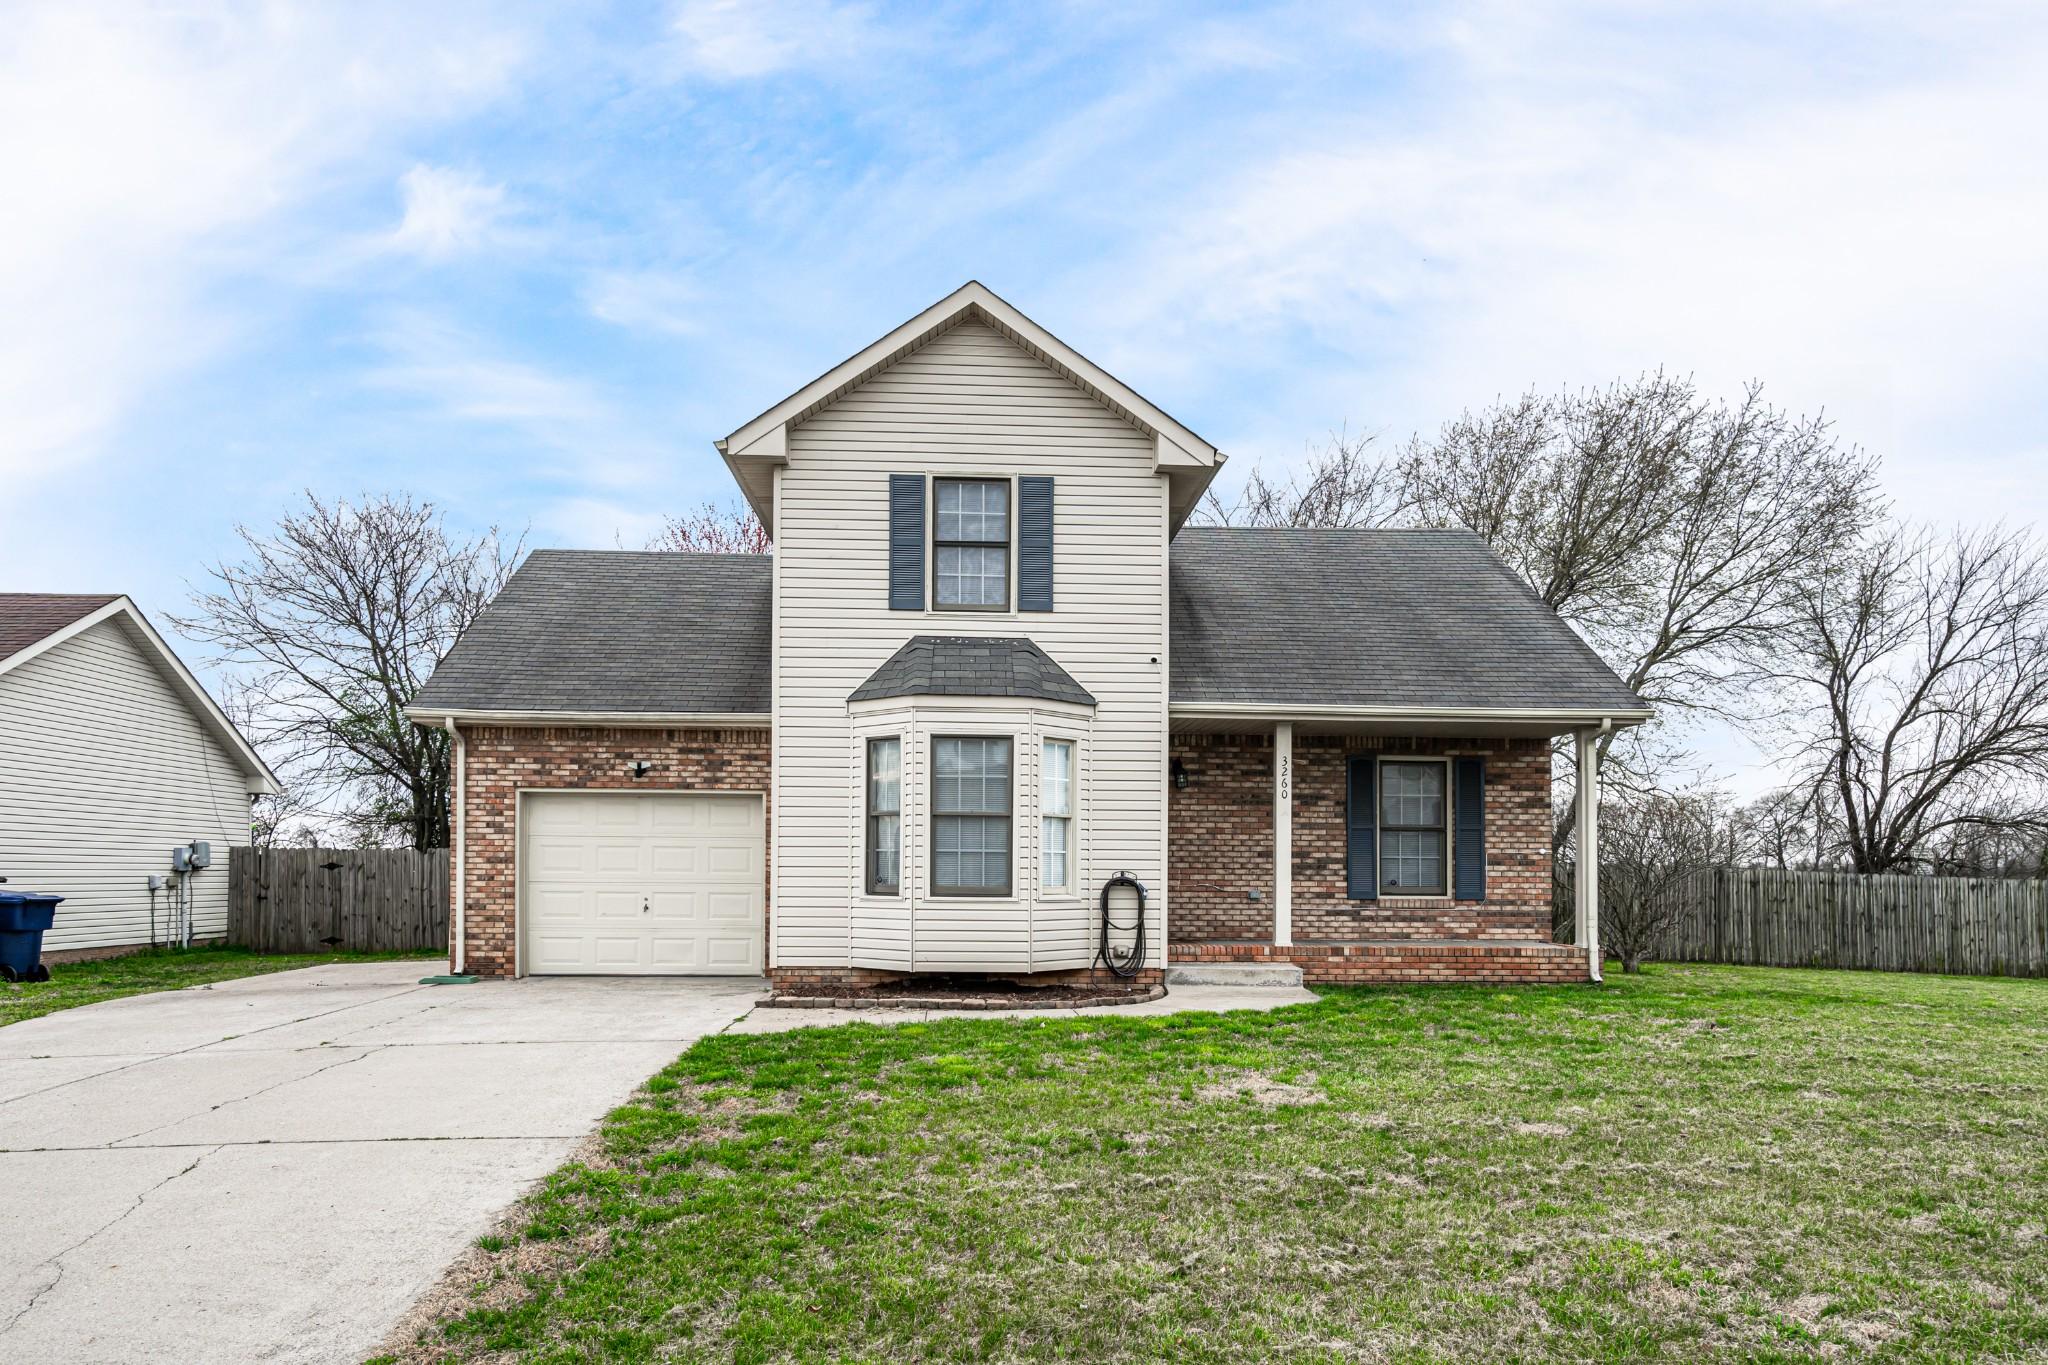 3260 S Senseney Cir Property Photo - Clarksville, TN real estate listing